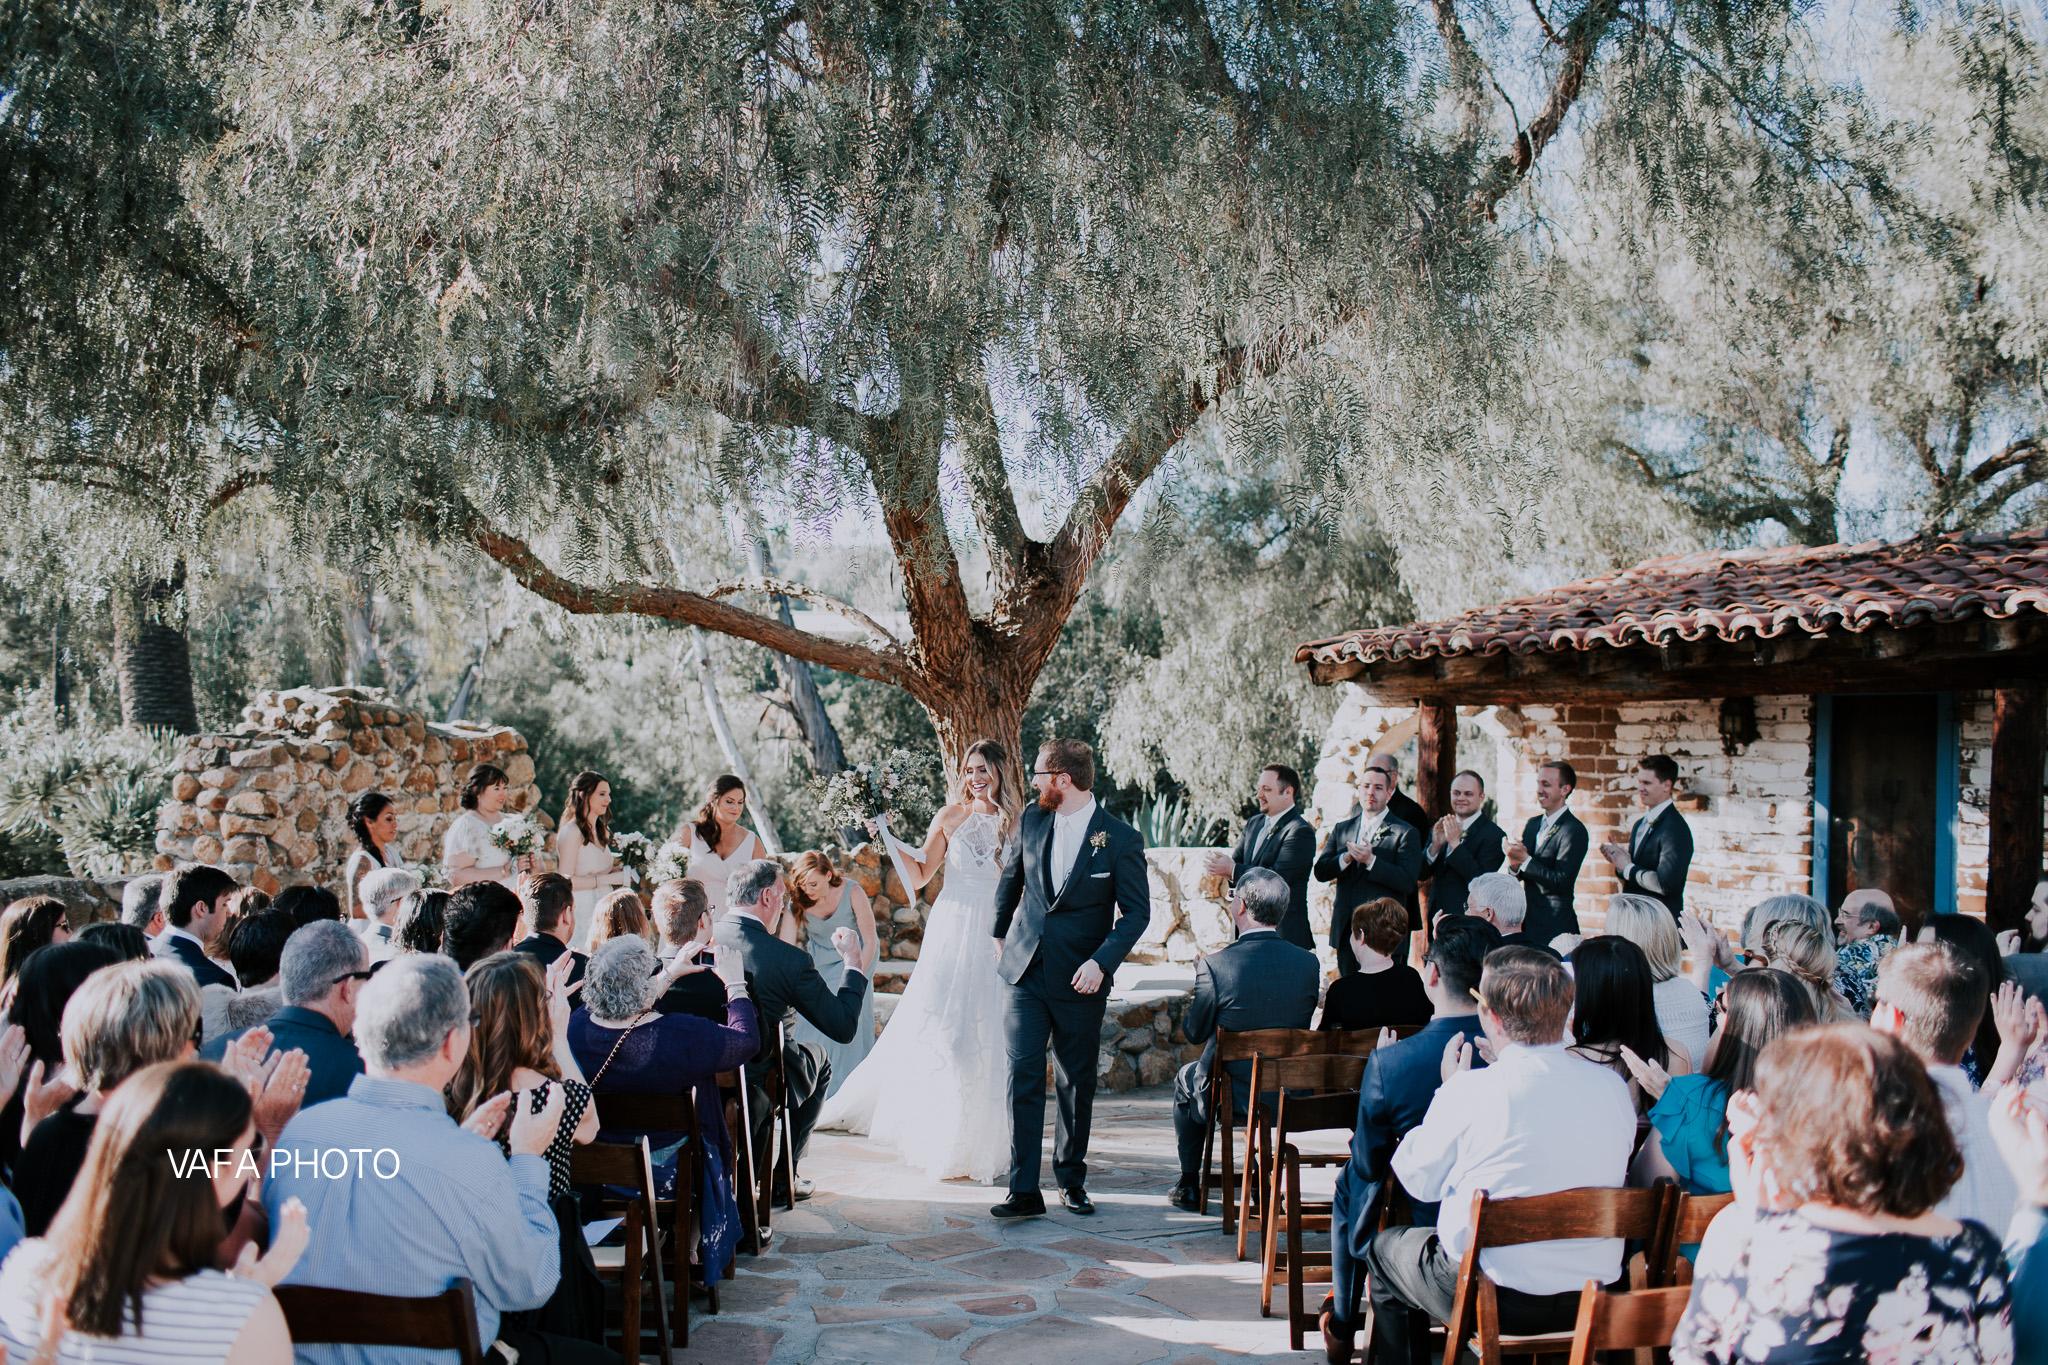 Leo-Carrillo-Ranch-Wedding-Lauren-Mike-Vafa-Photo-650.jpg